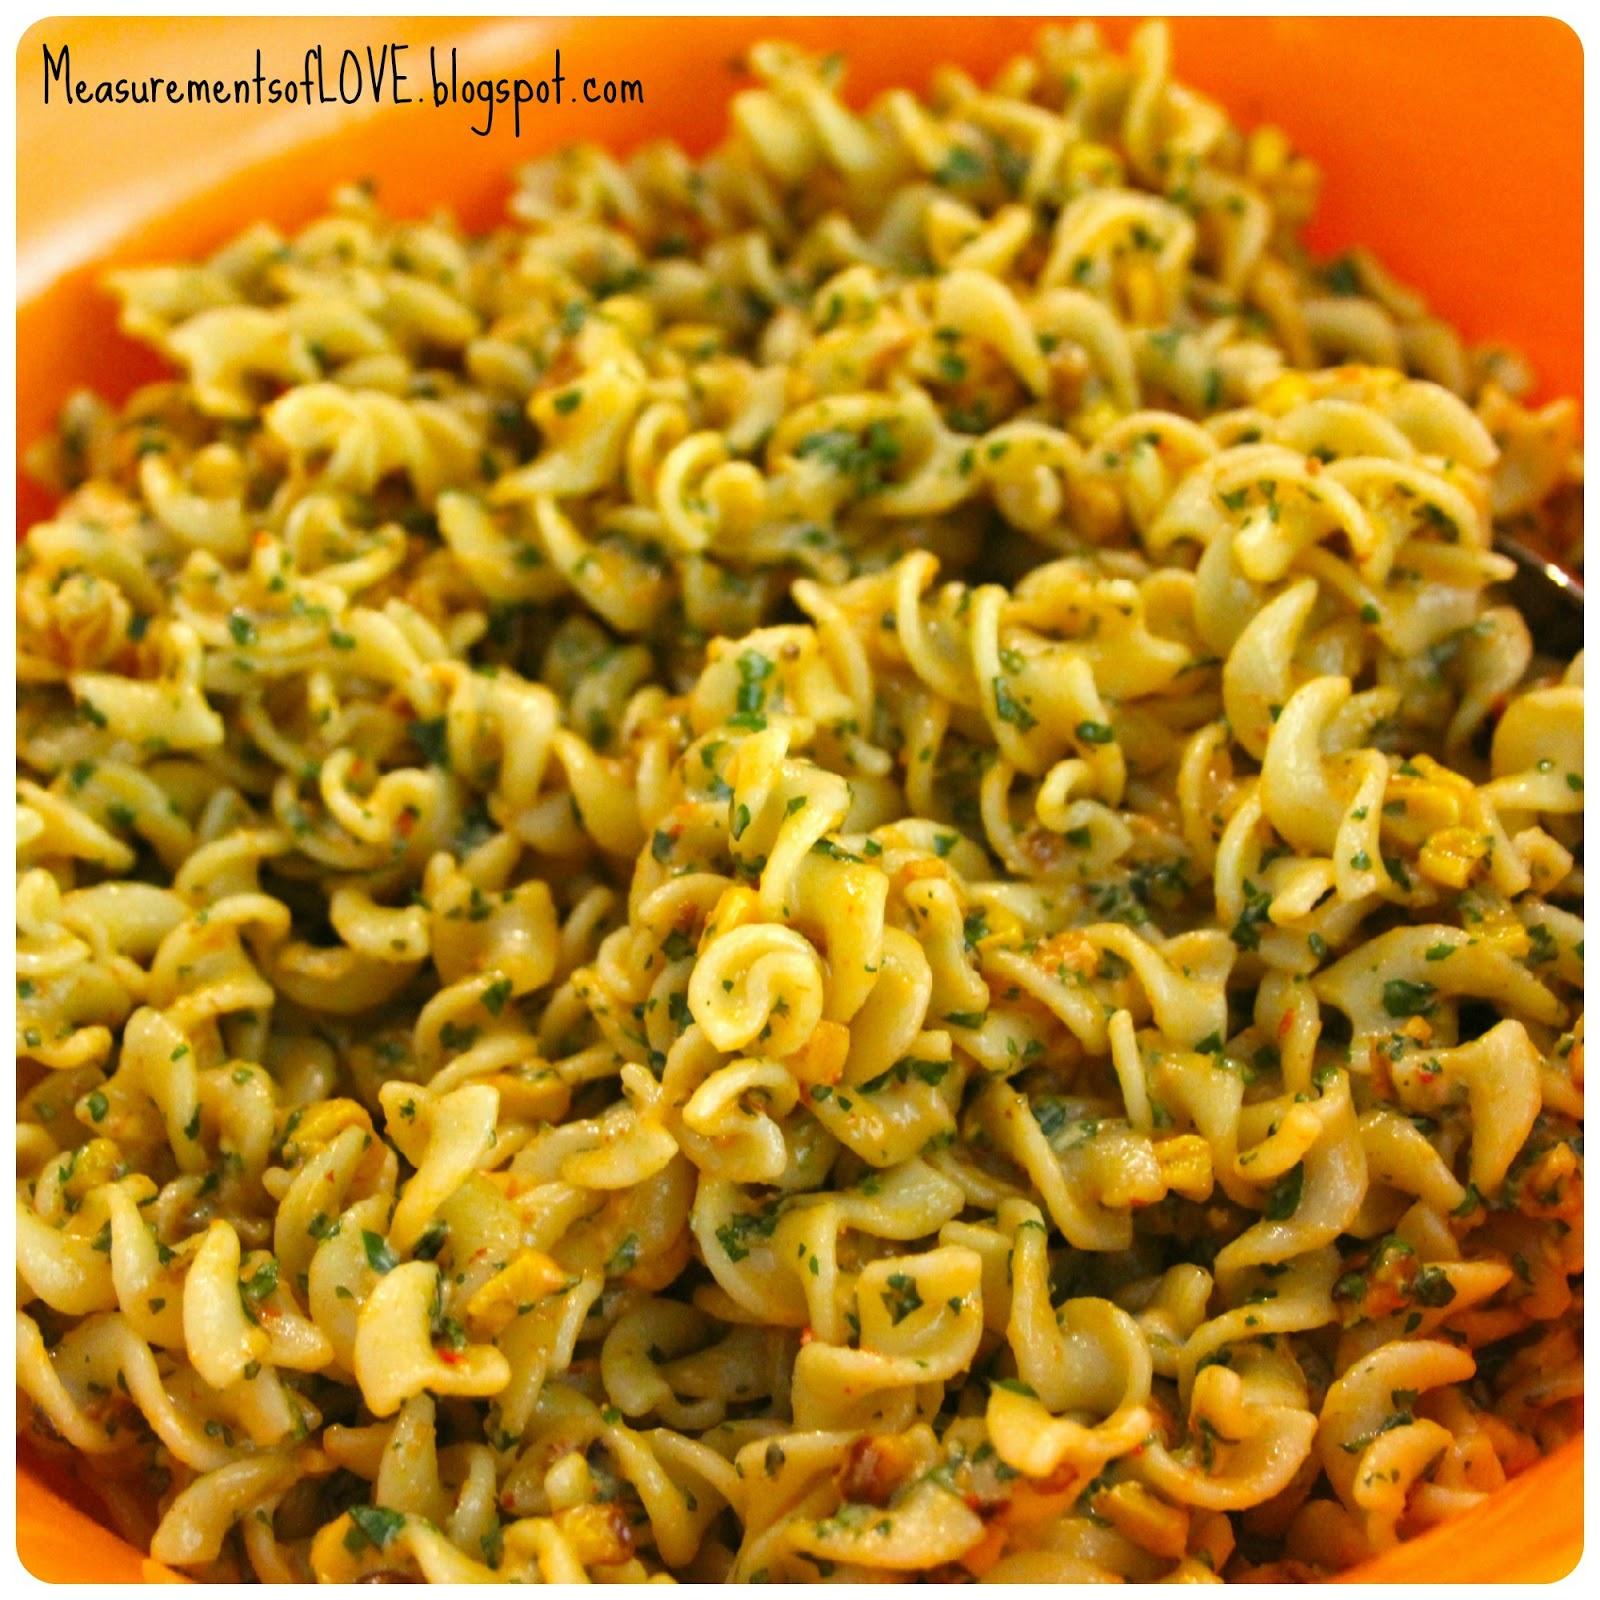 Measurements of Merriment: Roasted Corn Pasta Salad